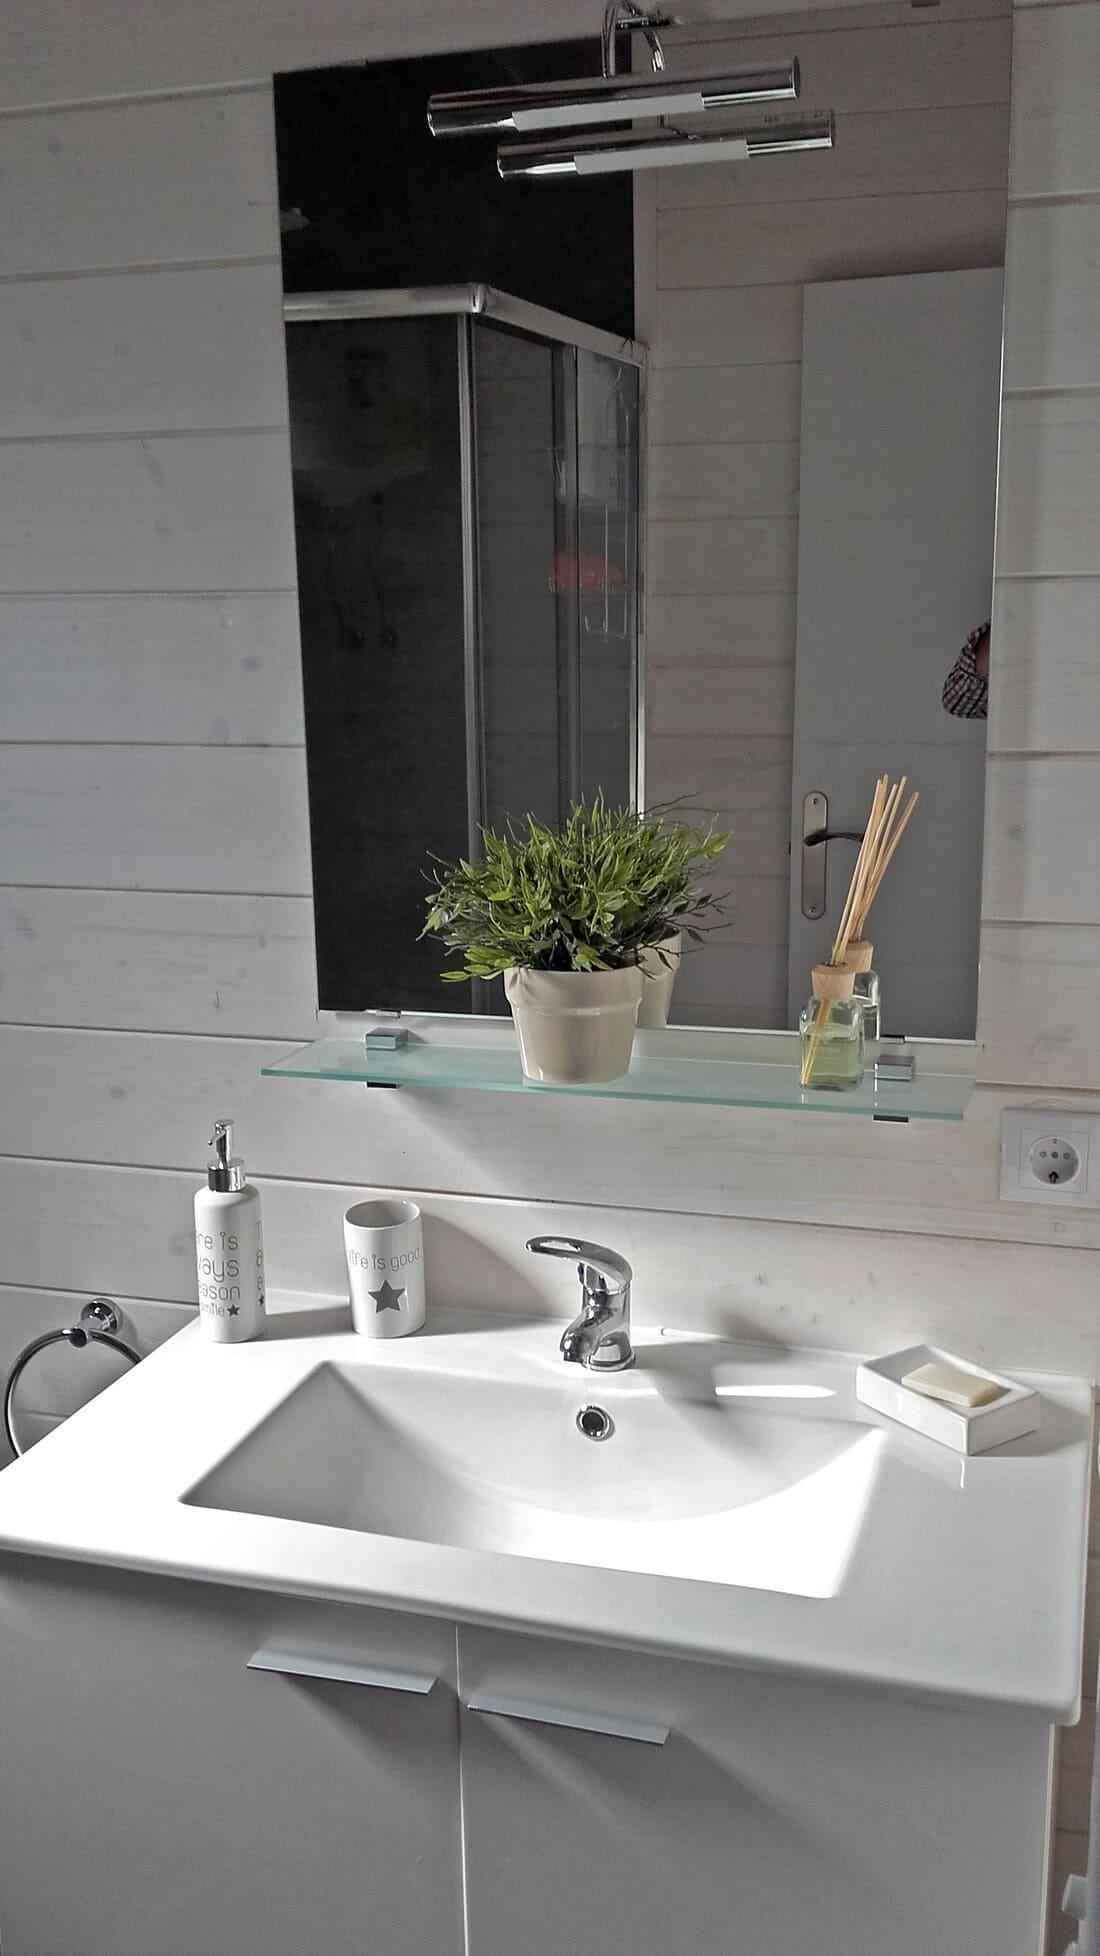 Interior caseta de madera habitable madrid Caseta Living